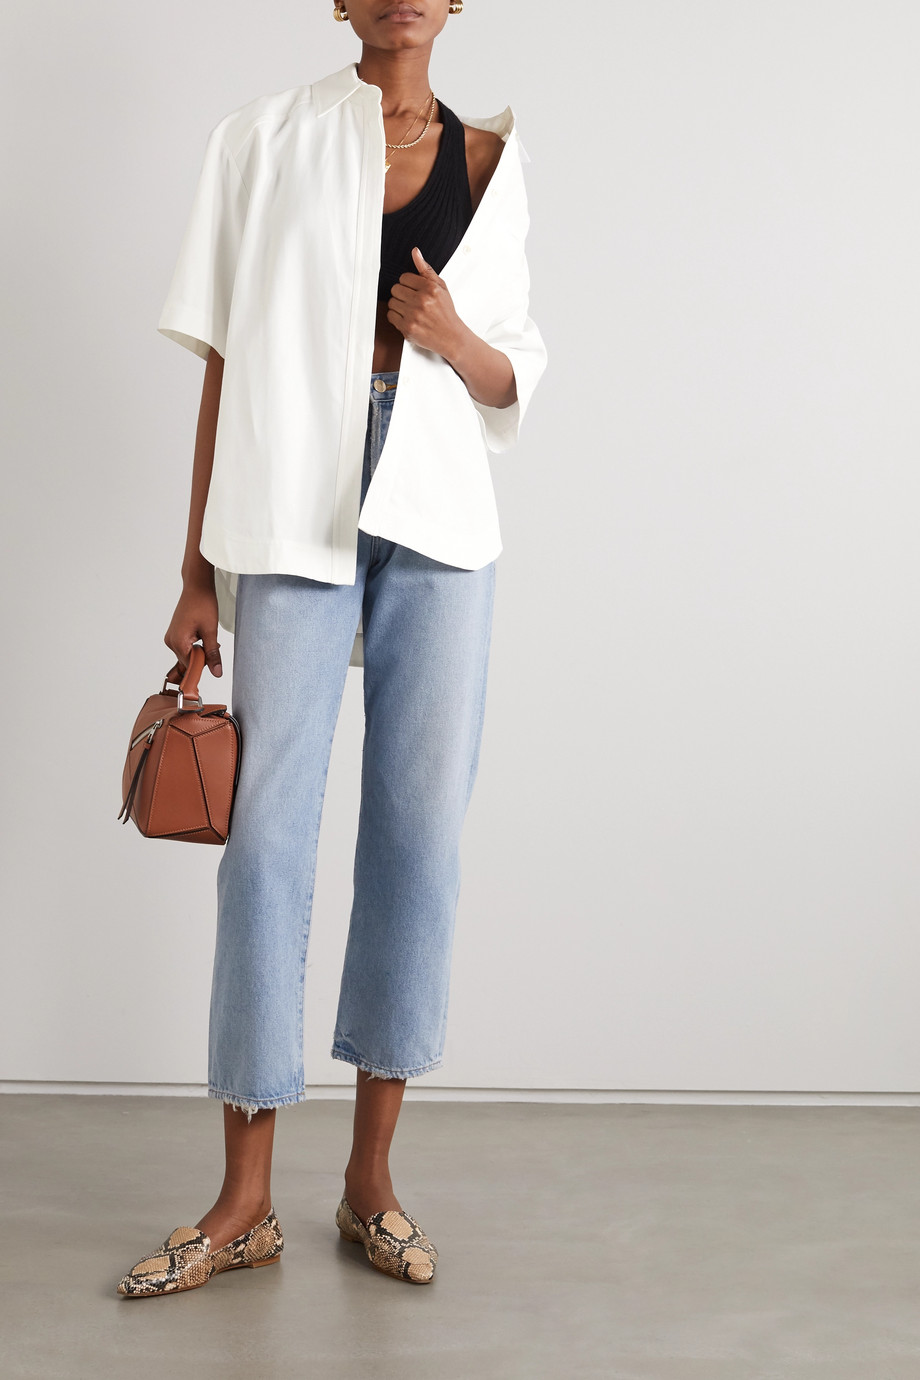 LOULOU STUDIO Moheli woven shirt